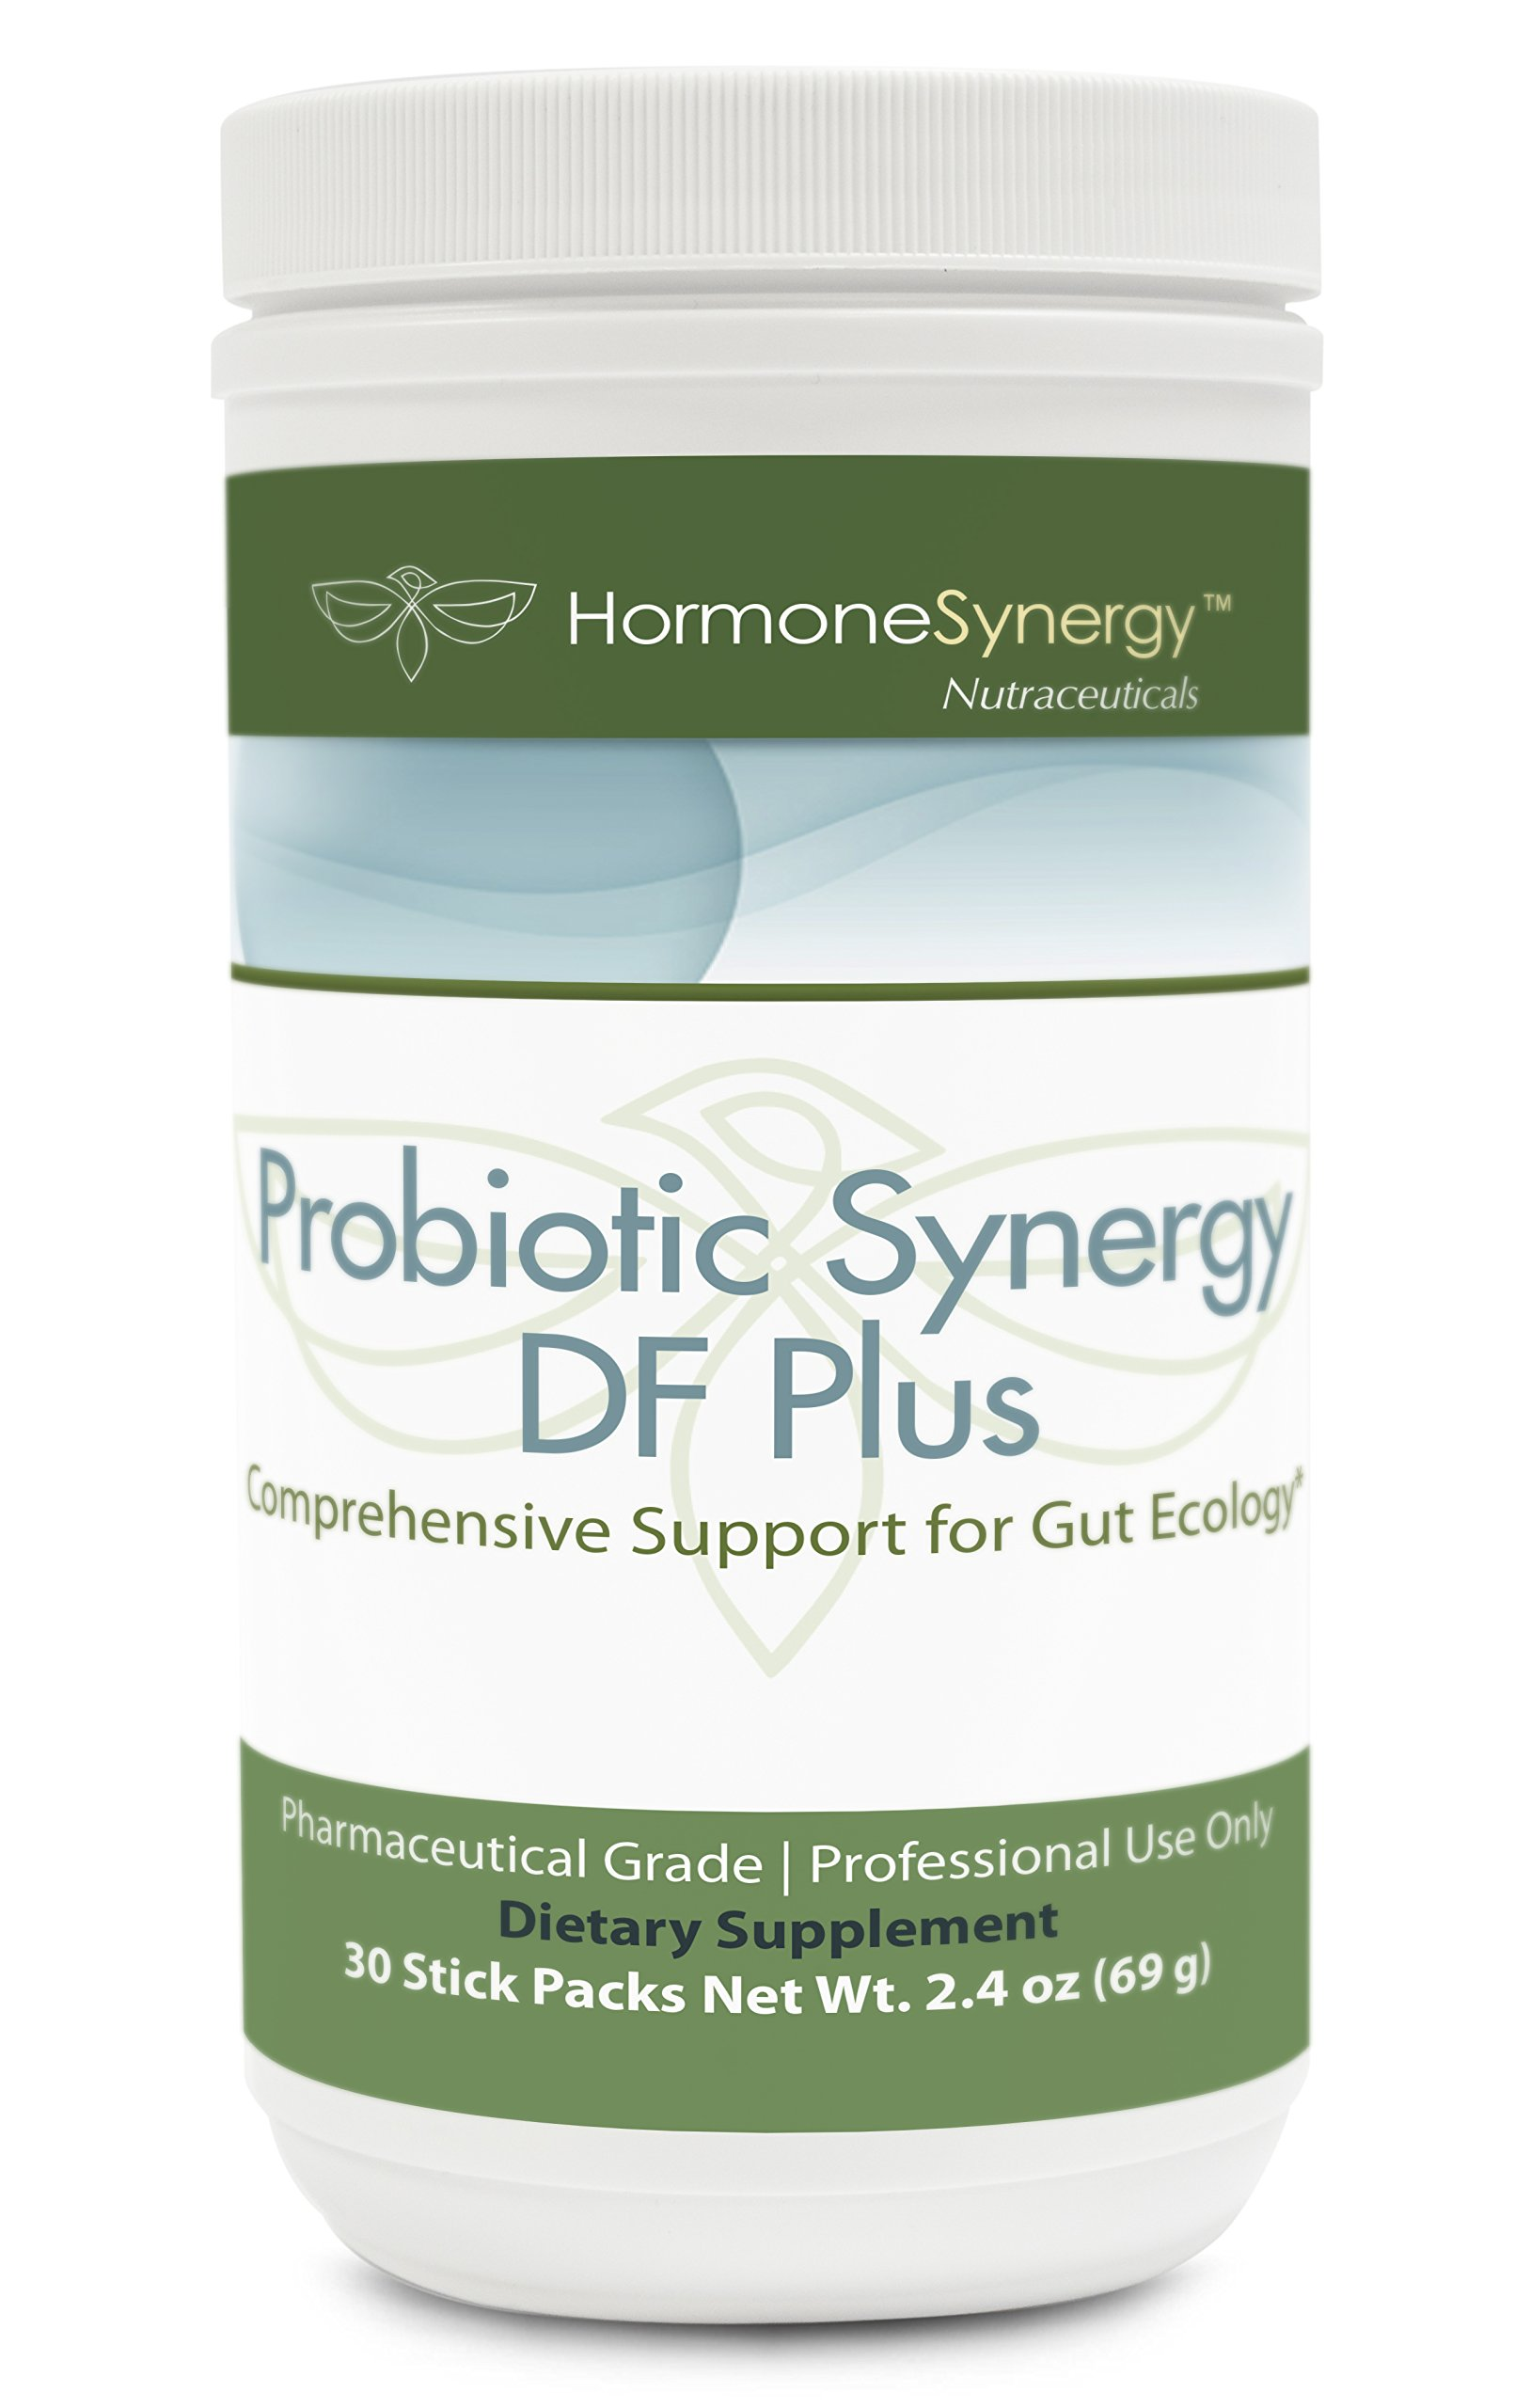 Probiotic Synergy DF Plus | 30 Billion CFU PLUS Saccharomyces boulardii and Arabinogalactan | 30 Stick Packs | Comprehensive Support for Gut Ecology* | Professional Formula | Free eBook